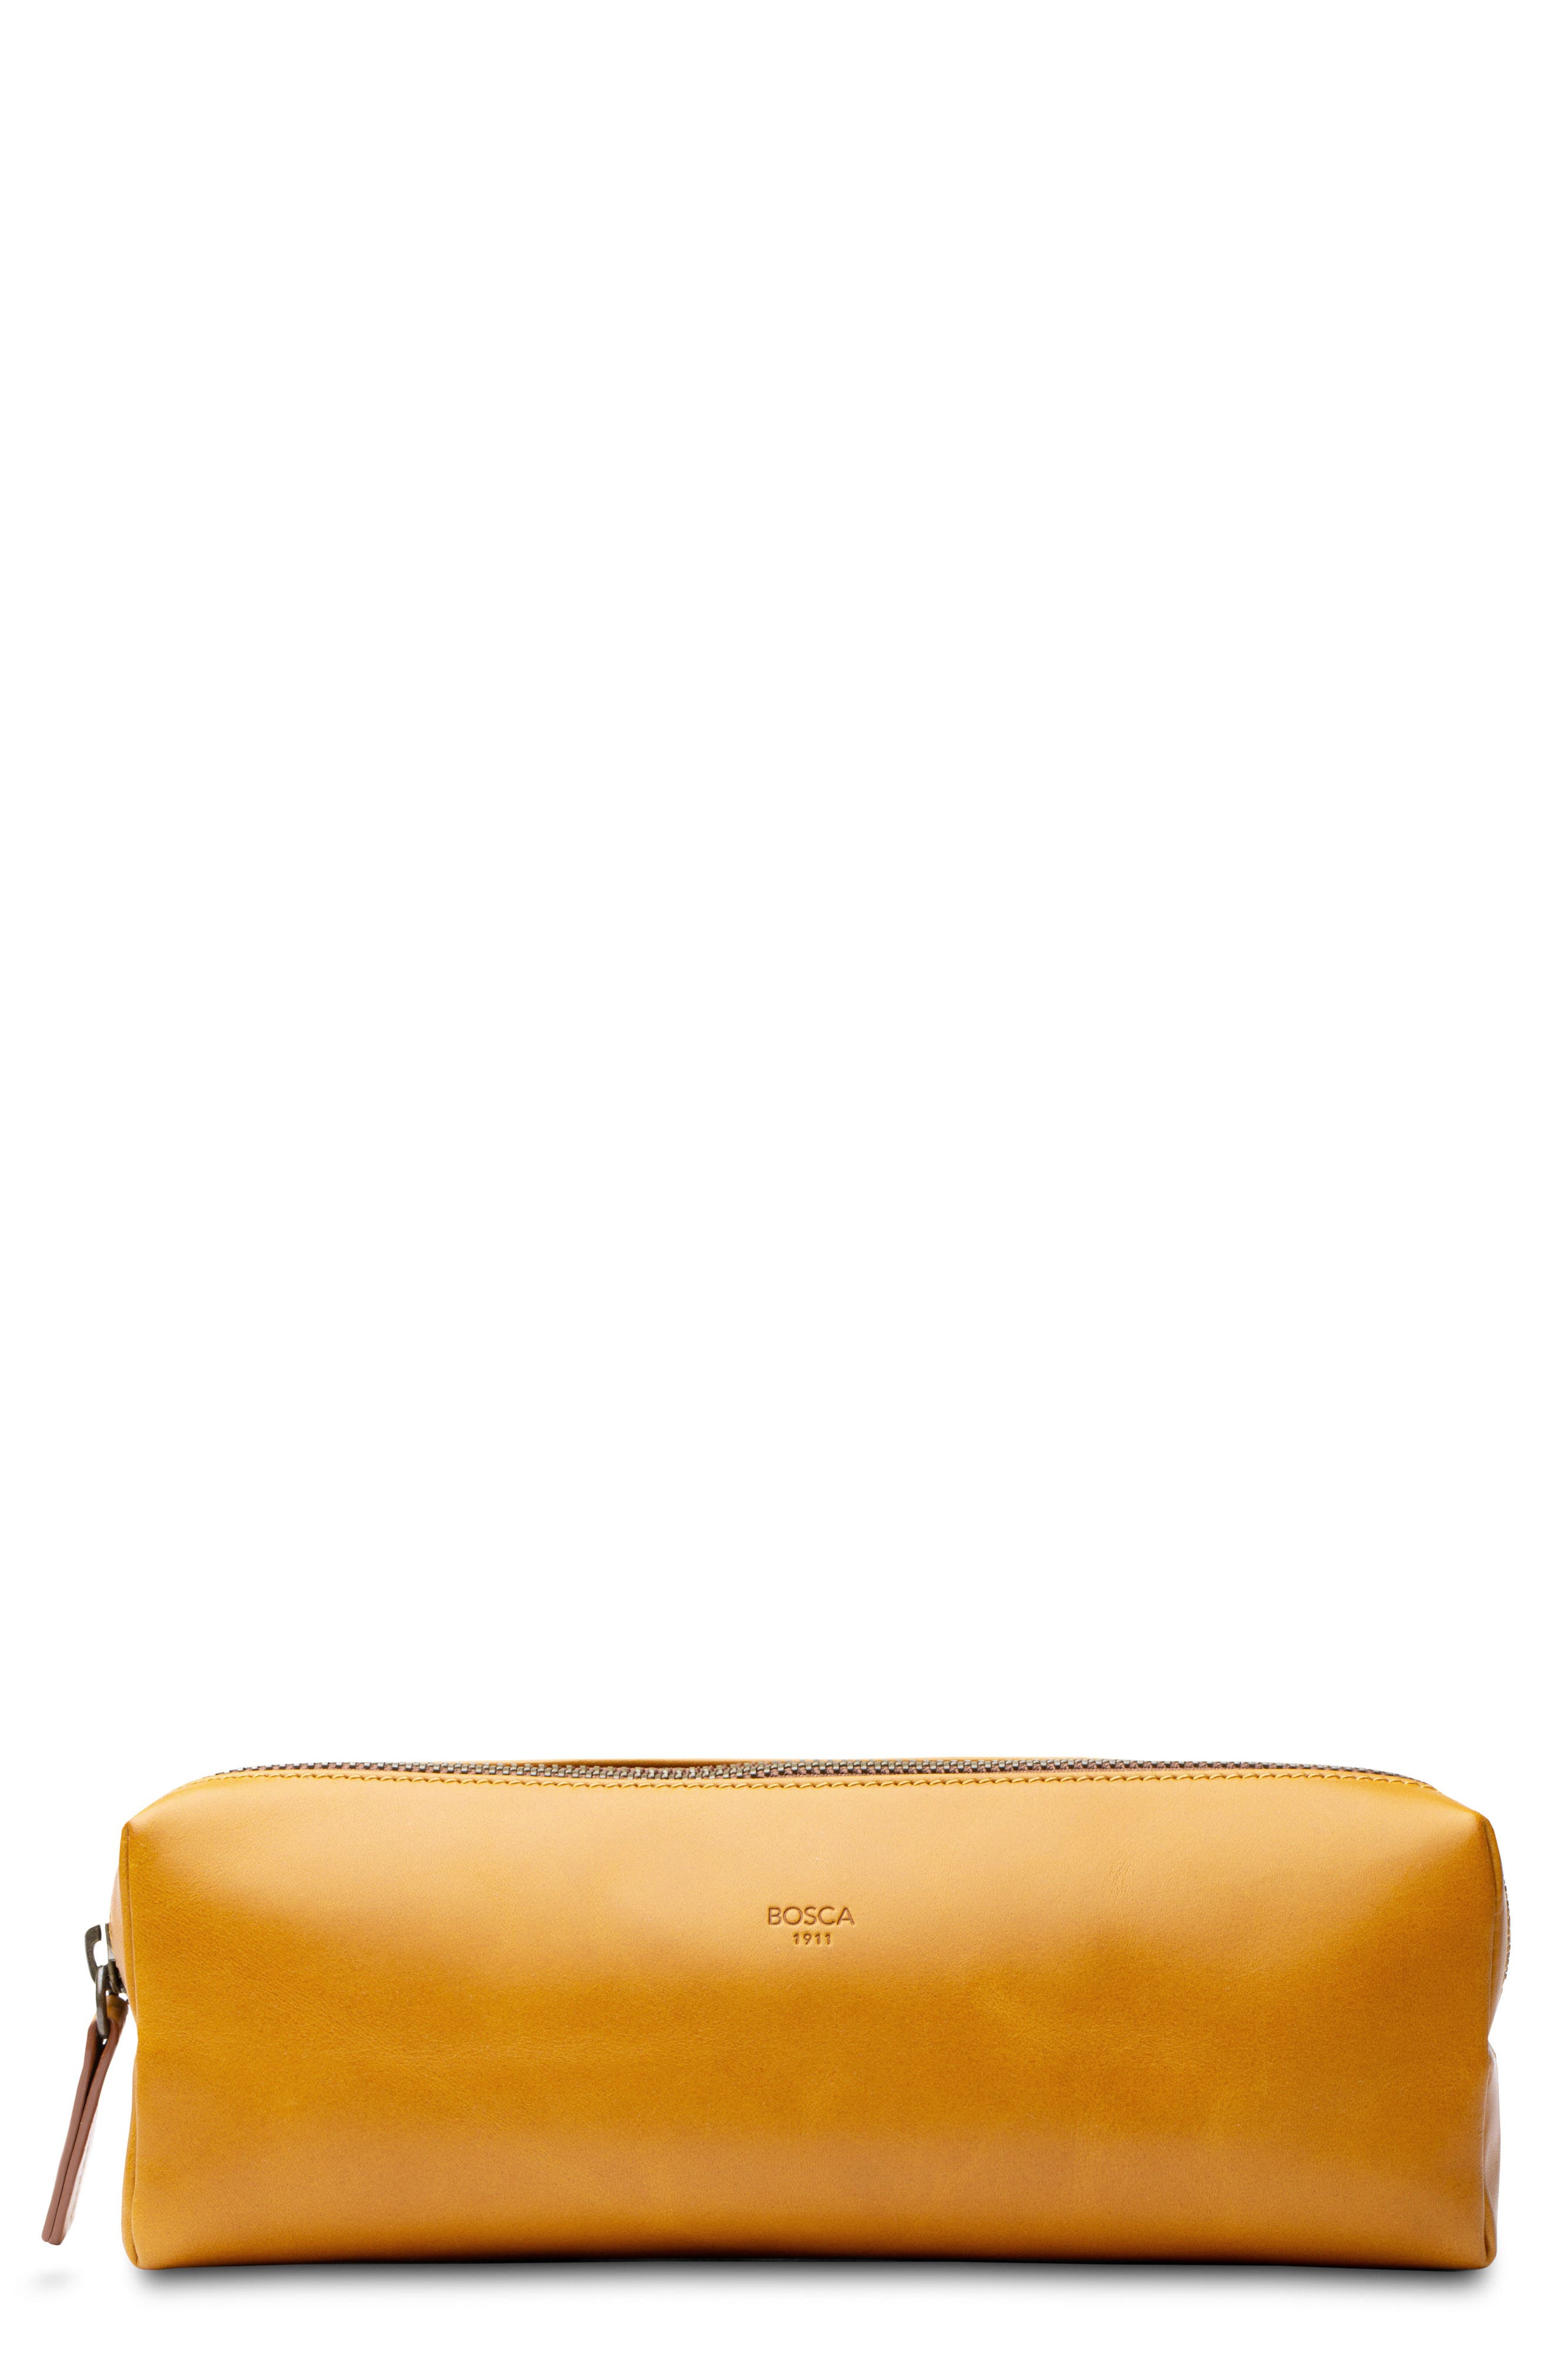 Italo Leather Pencil Case